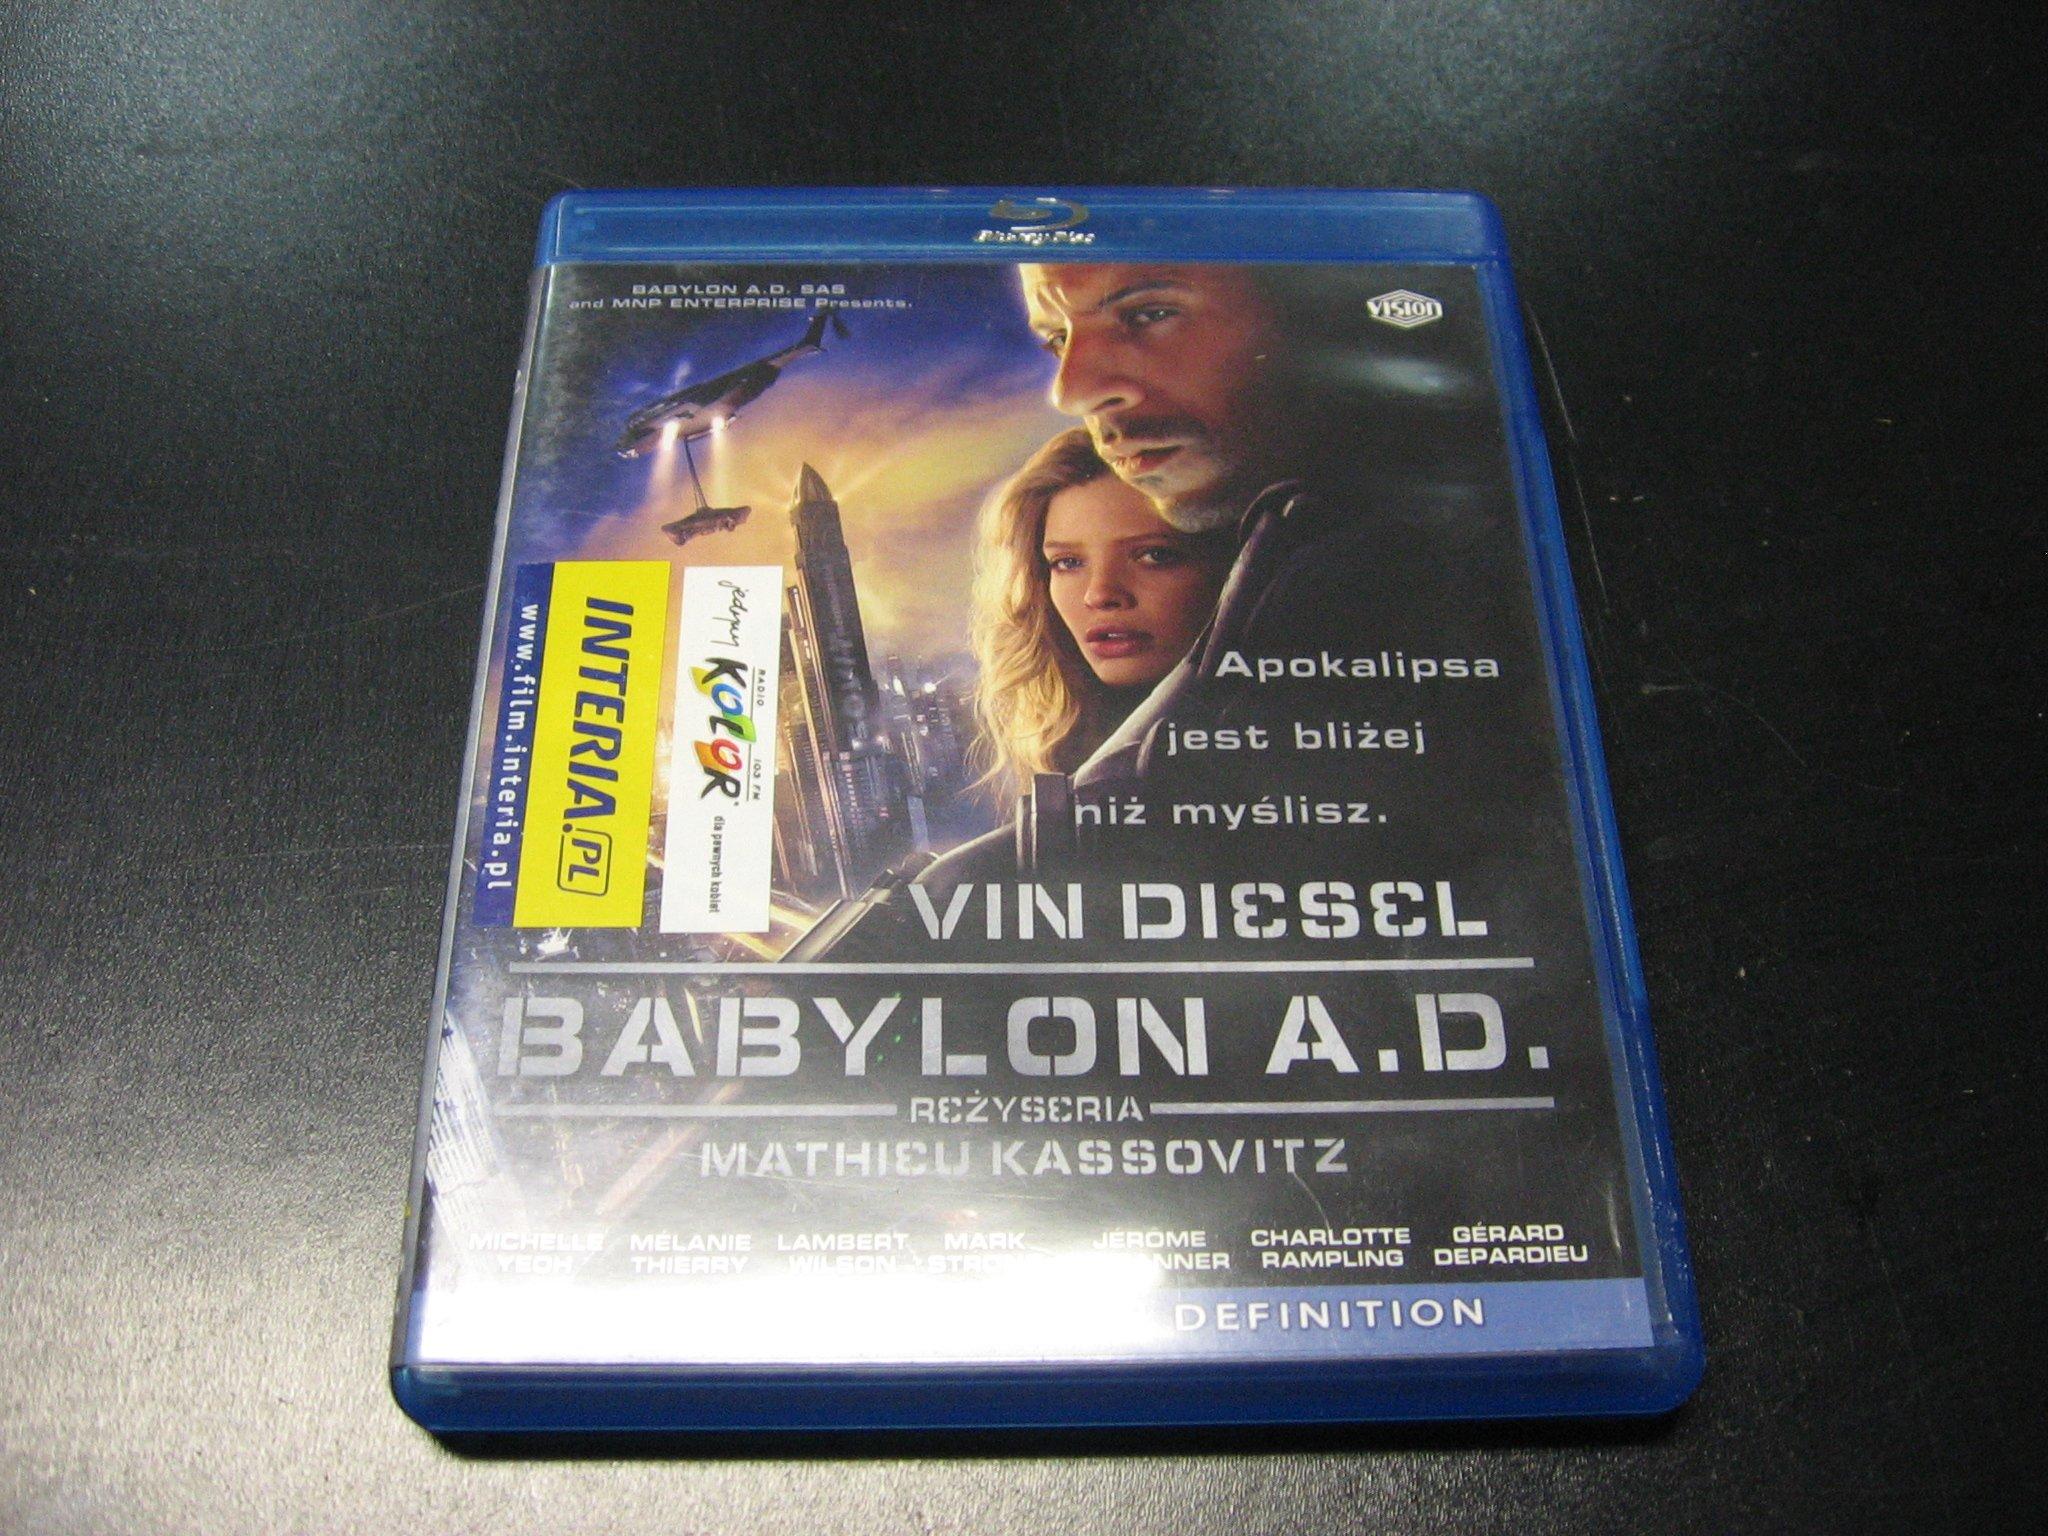 BABYLON A.D. 064 `````````` Blu-rey ```````````` Opole